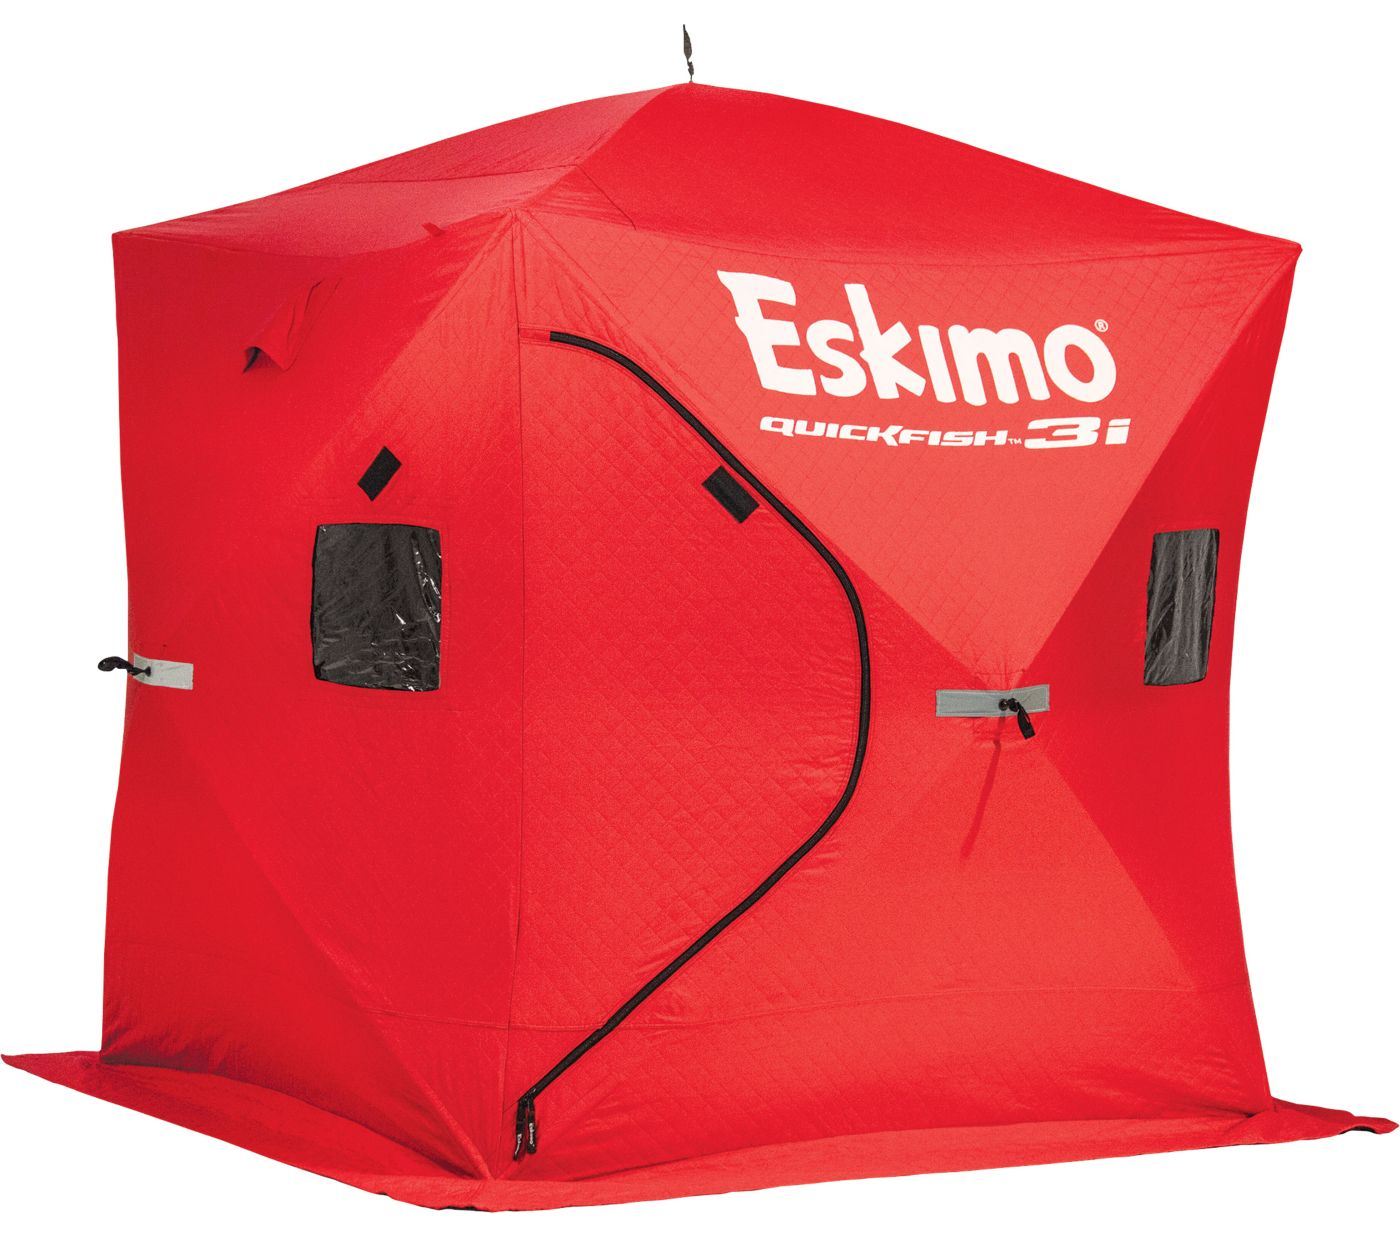 Eskimo Quickfish 3i Insulated 3-Person Ice Fishing Shelter